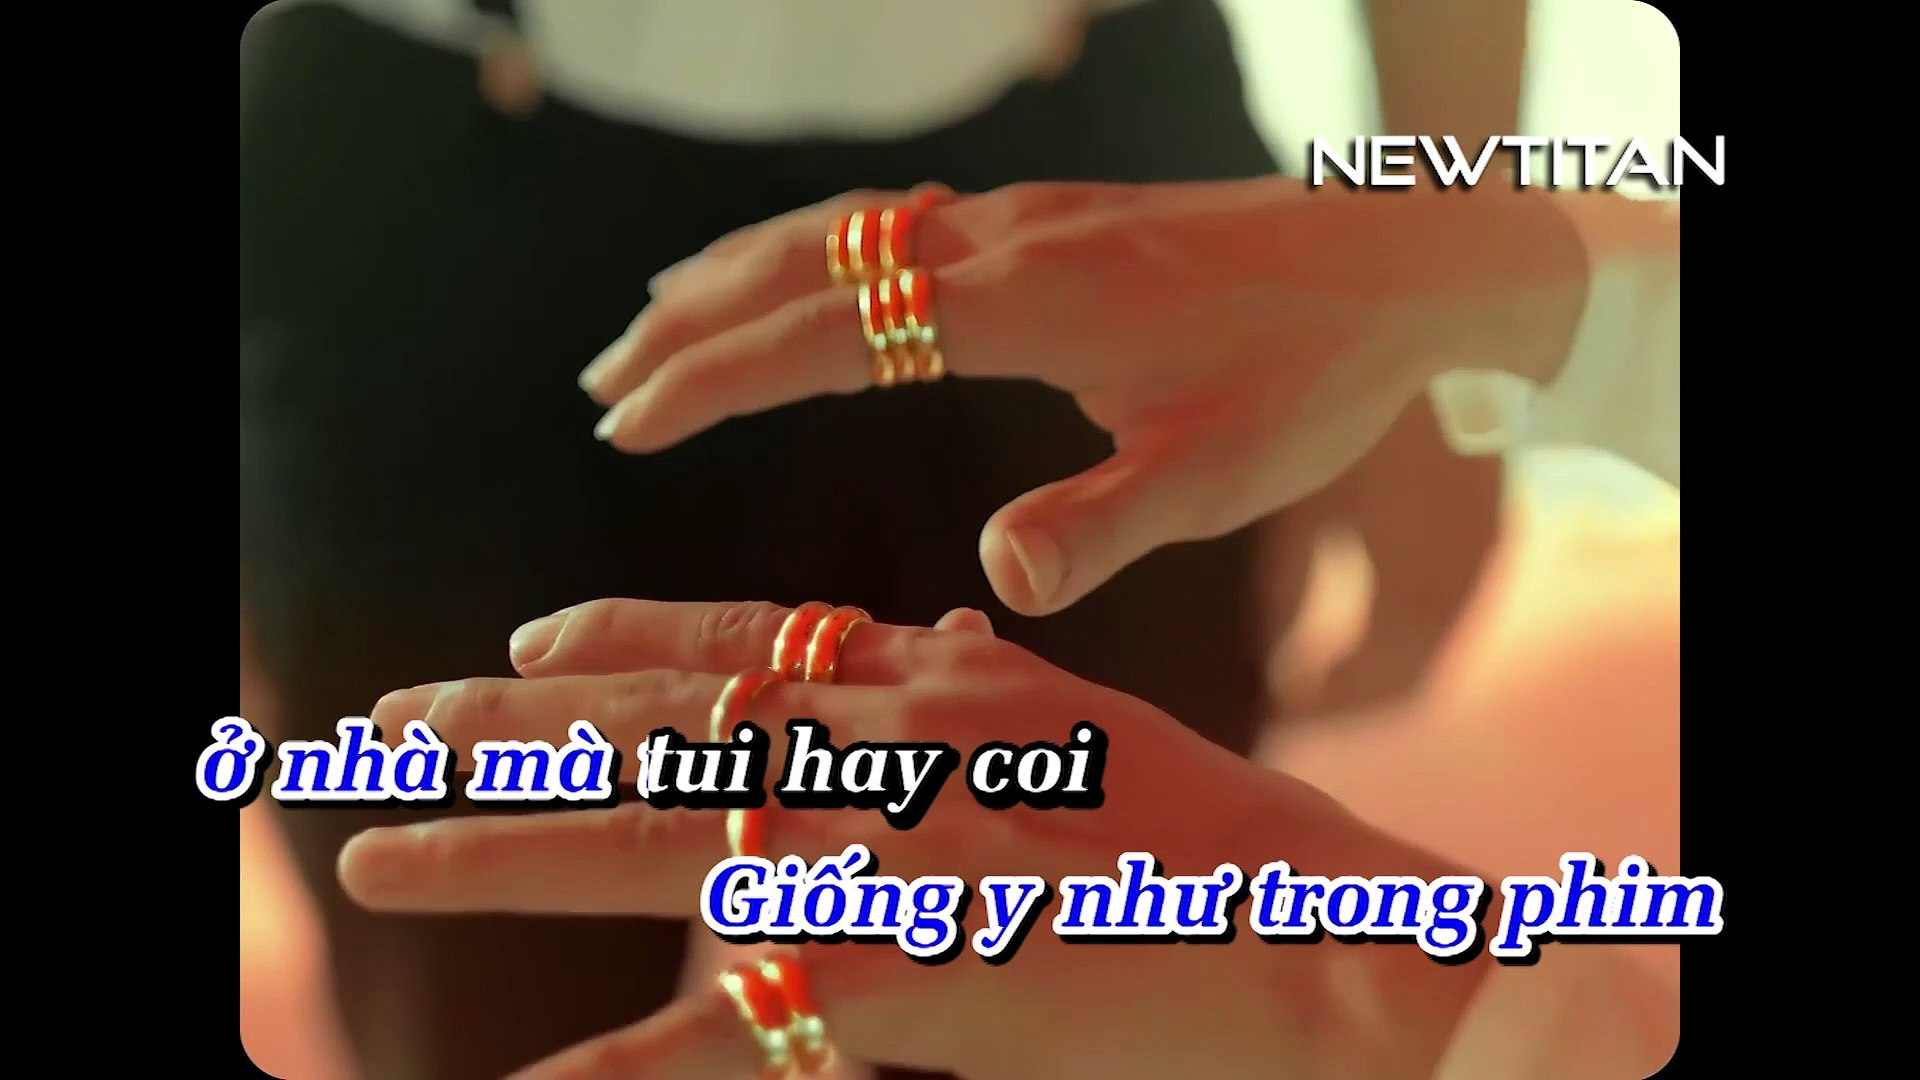 [Karaoke] Chuyện Tình Tôi - Kay Trần Ft. Nguyễn Khoa, Kass [Beat]